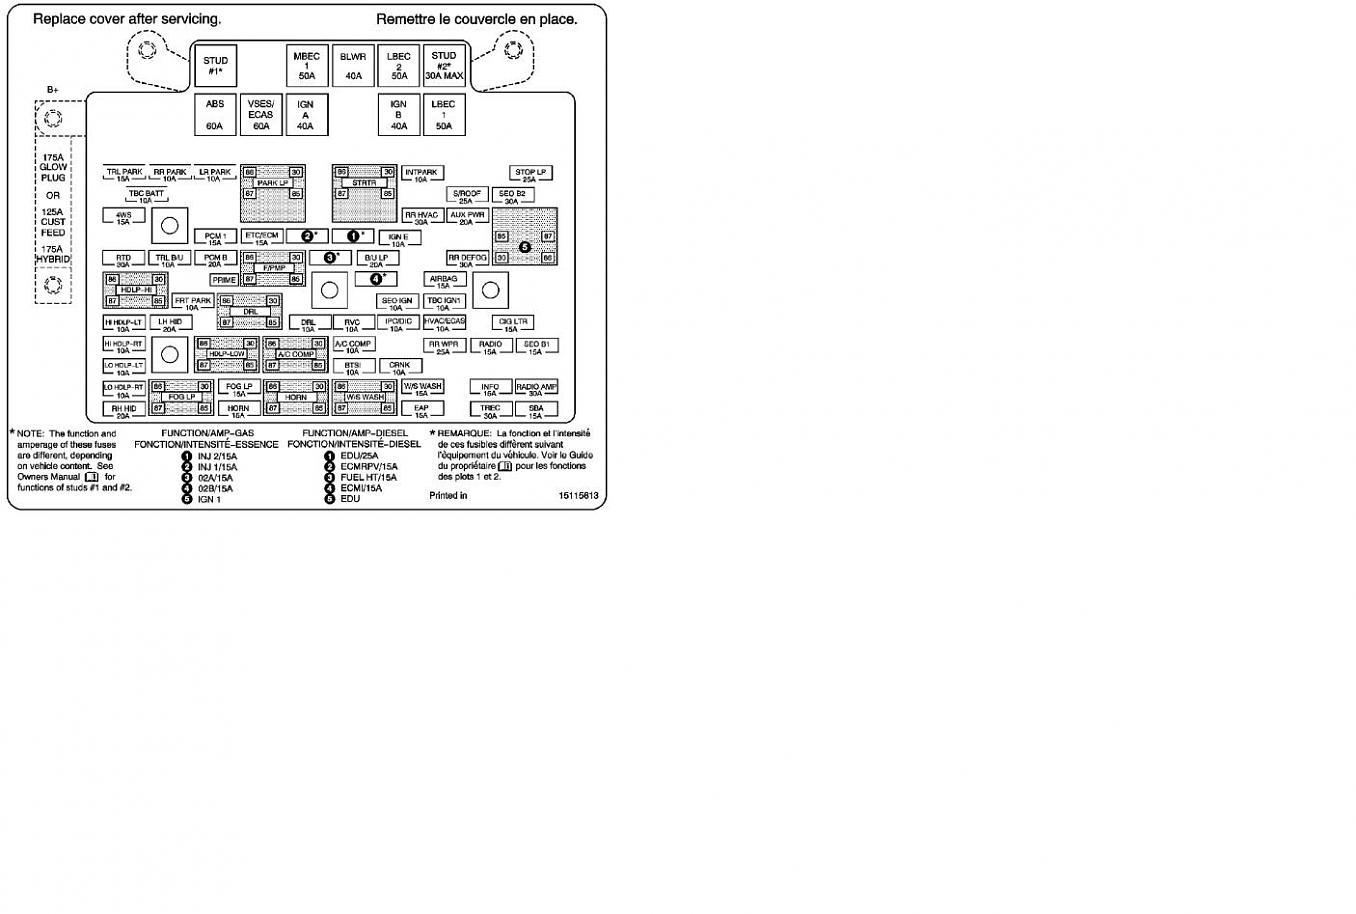 fl70 wiring diagram - wiring diagram data 1996 fl80 freightliner fuse box diagram  sound-cottbus.de